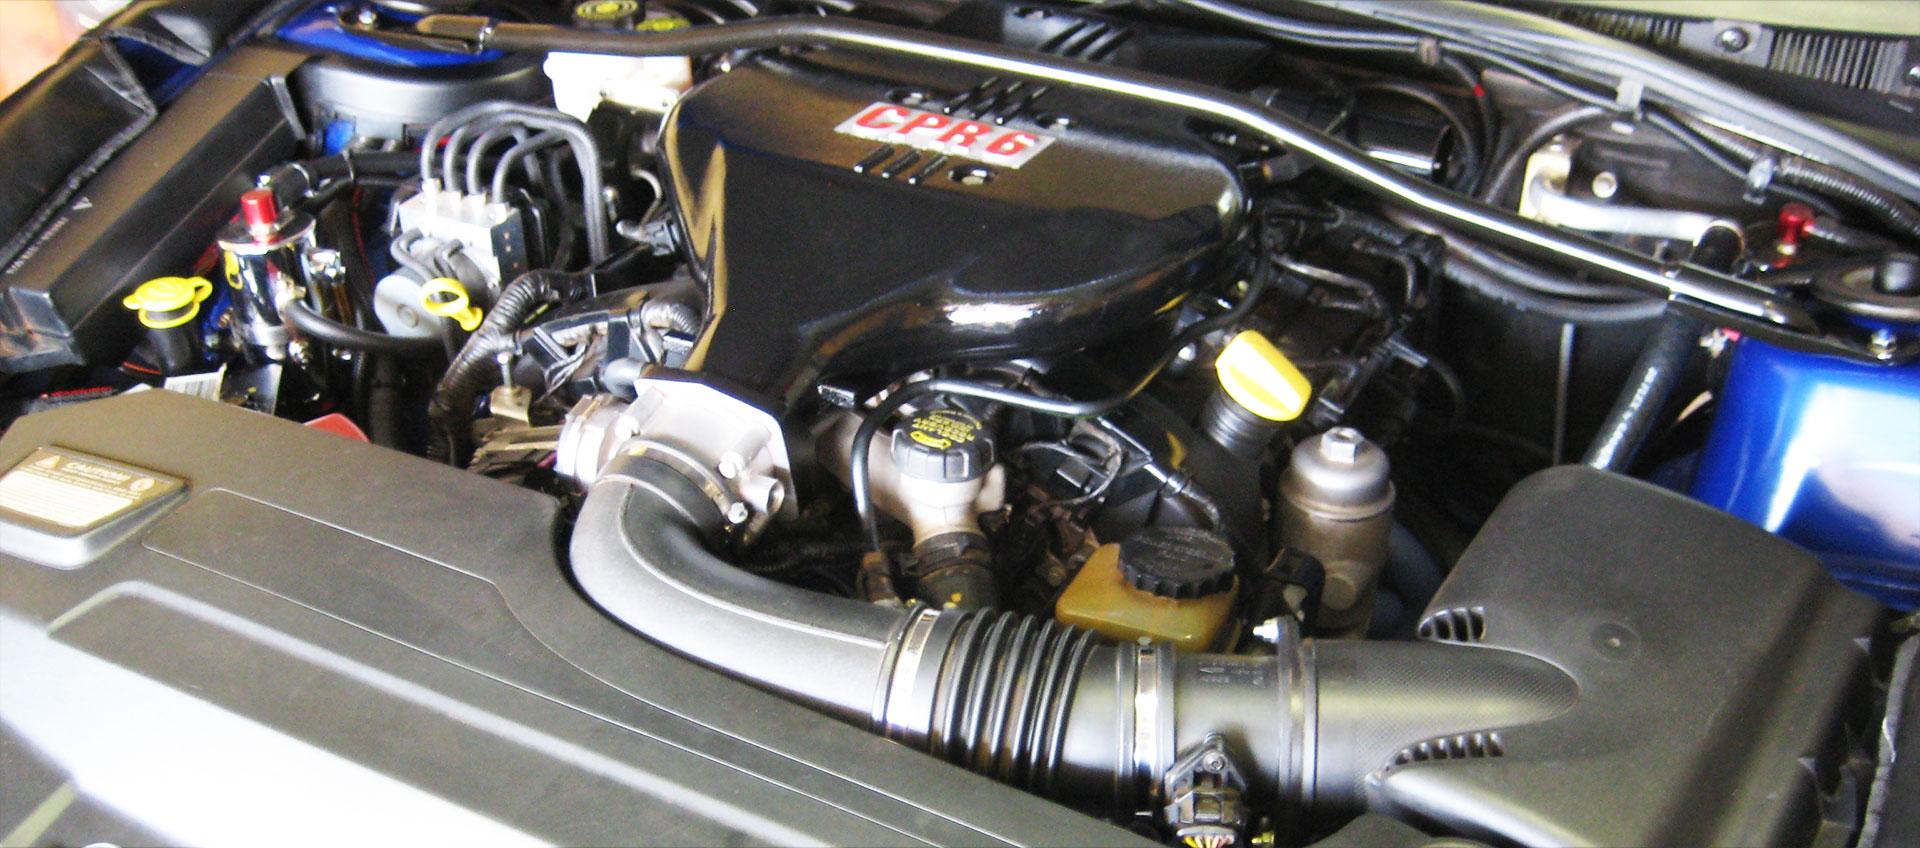 VZ-VE V6 Alloytec Commodore Manifold, CPR6 Manifold, Performance